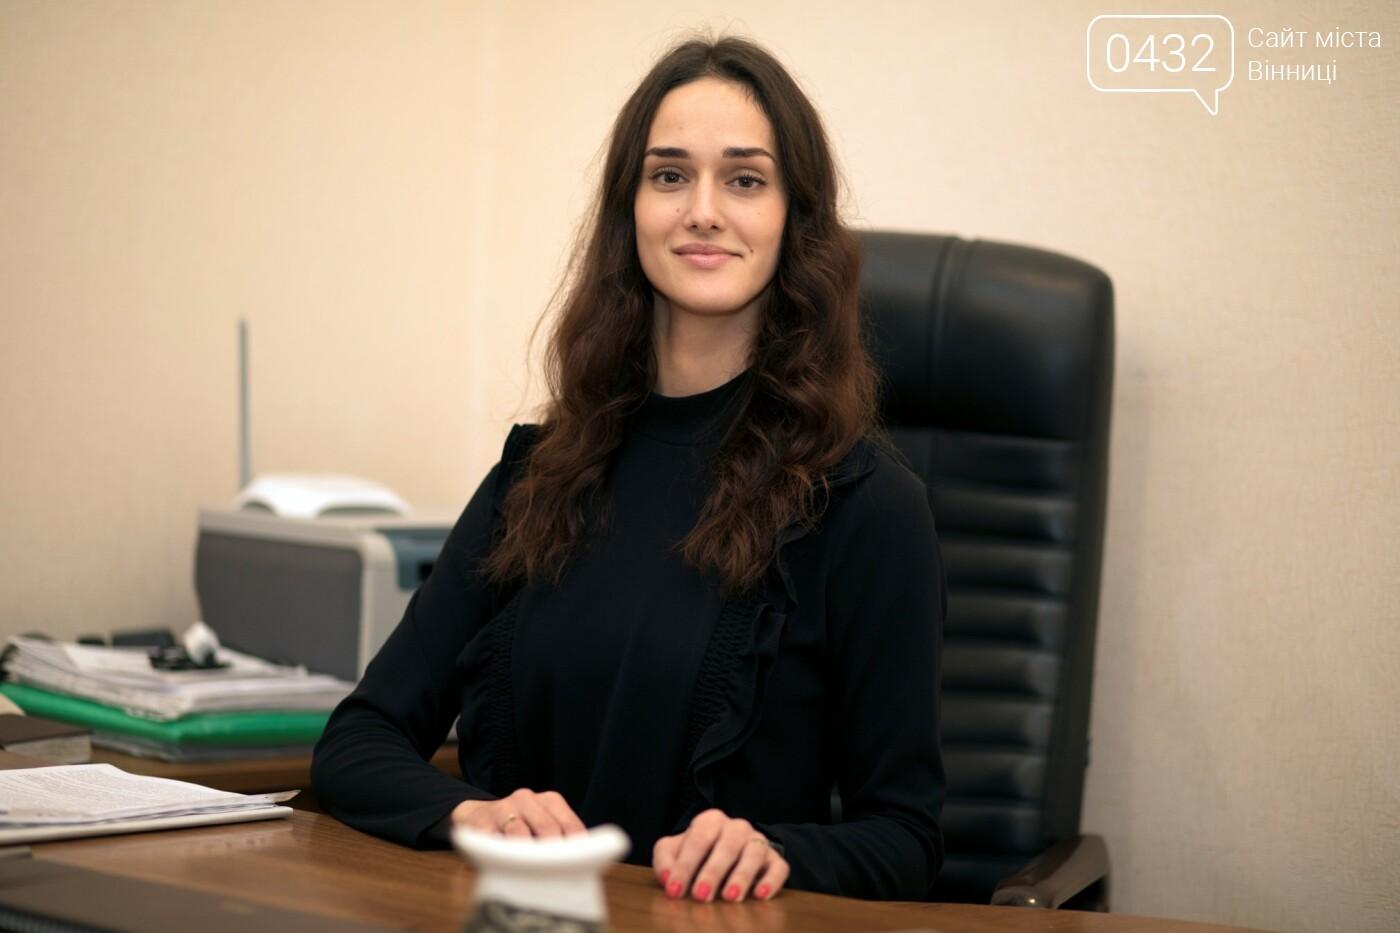 Как адвокаты избавили клиента от долгов: адвокат по кредитам Винница, фото-6